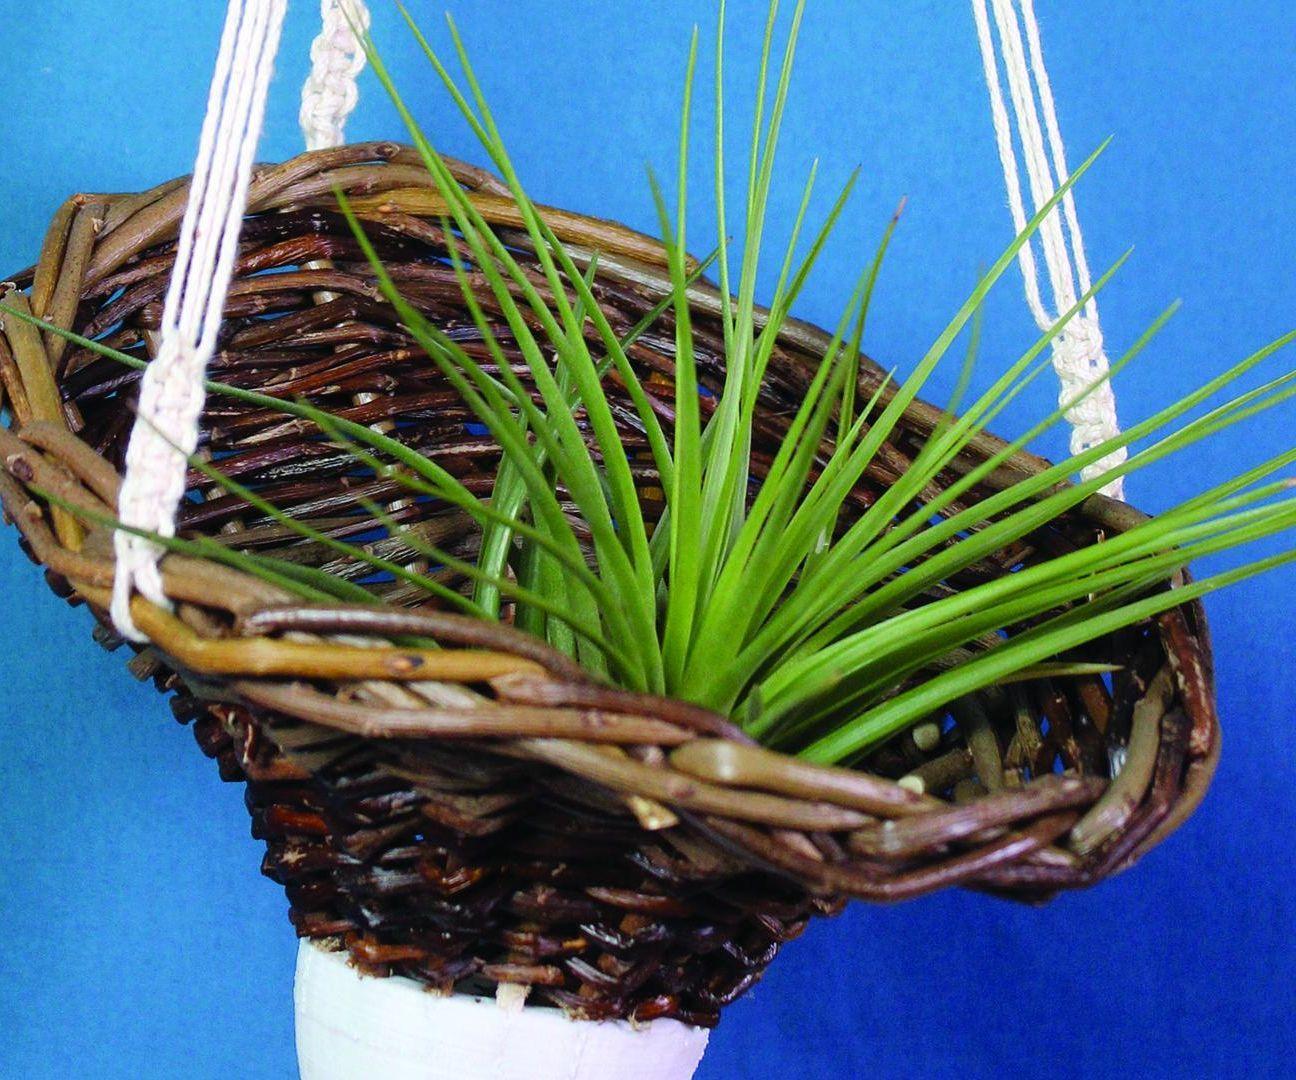 Basketry 2.0 - Air Plant